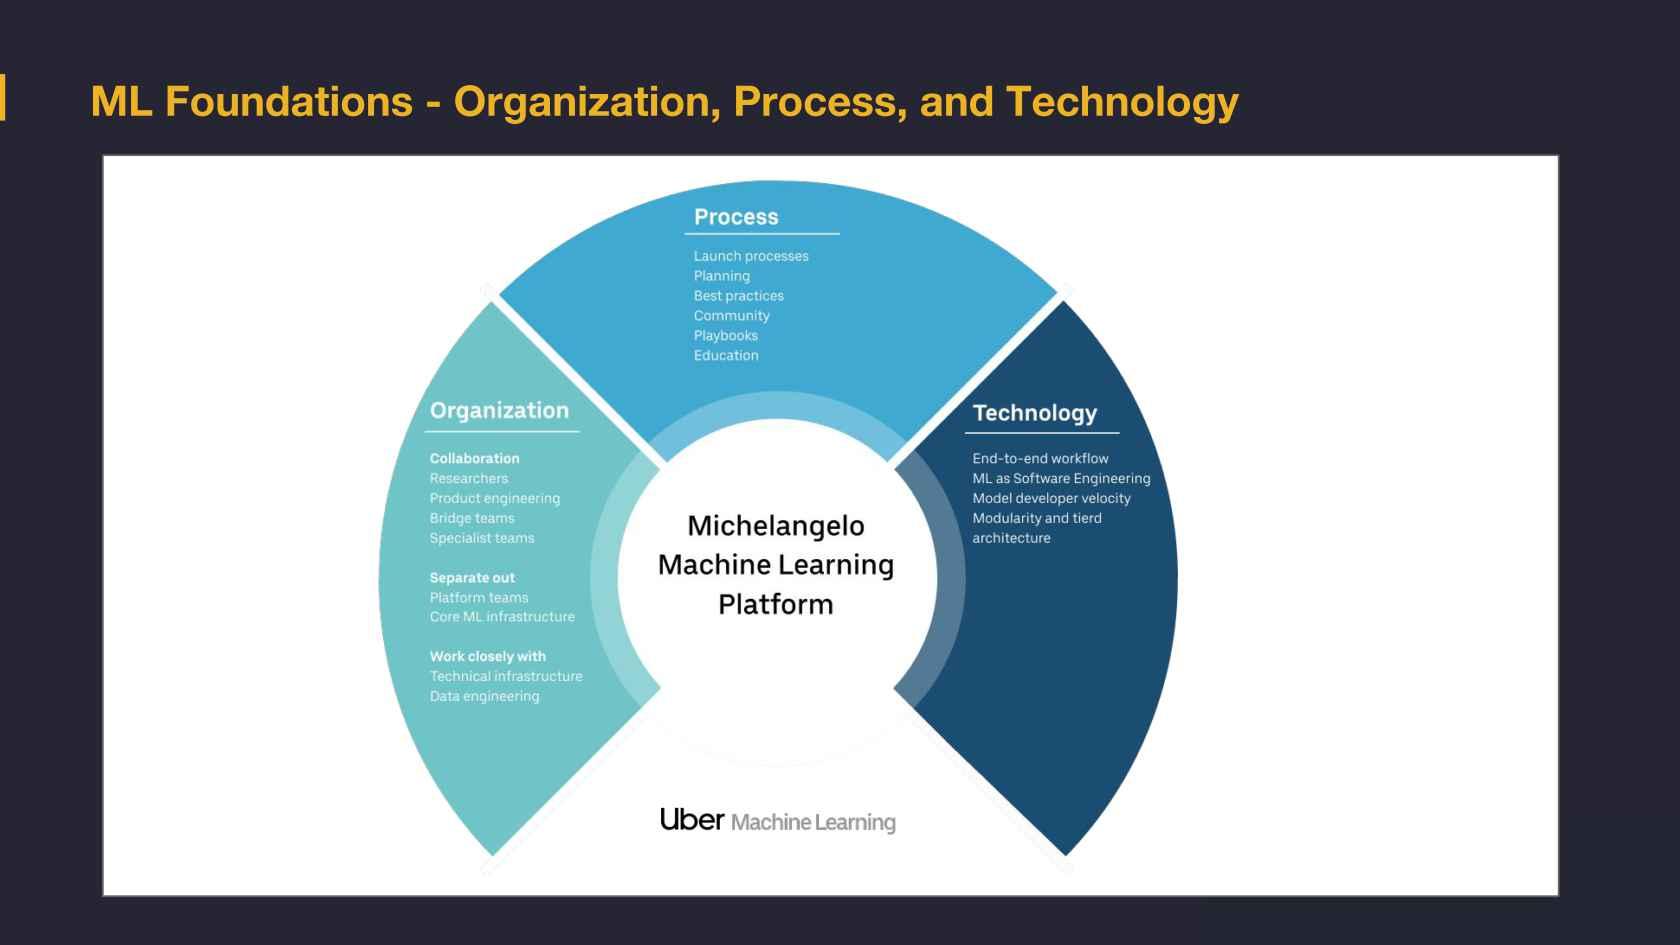 Michelangelo - Machine Learning @Uber